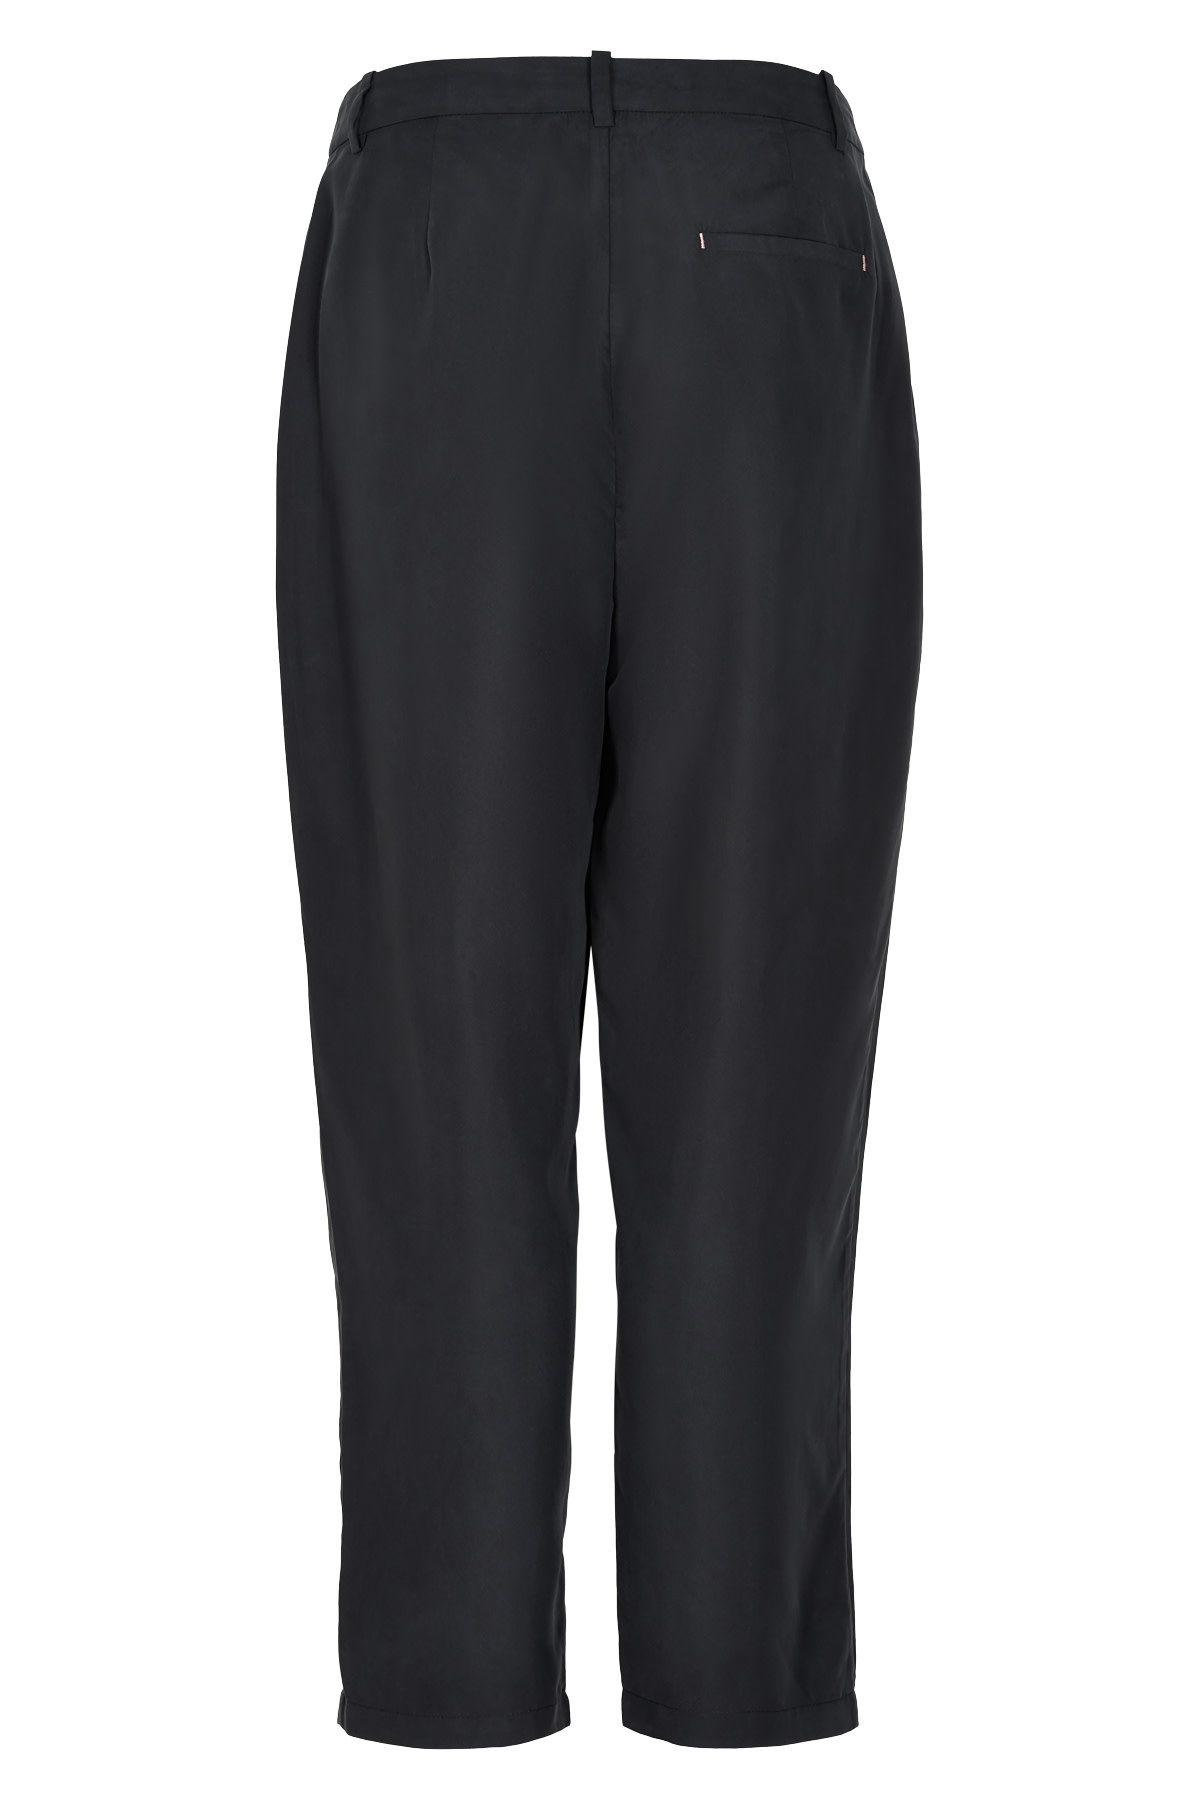 Nümph New Keziah Pants